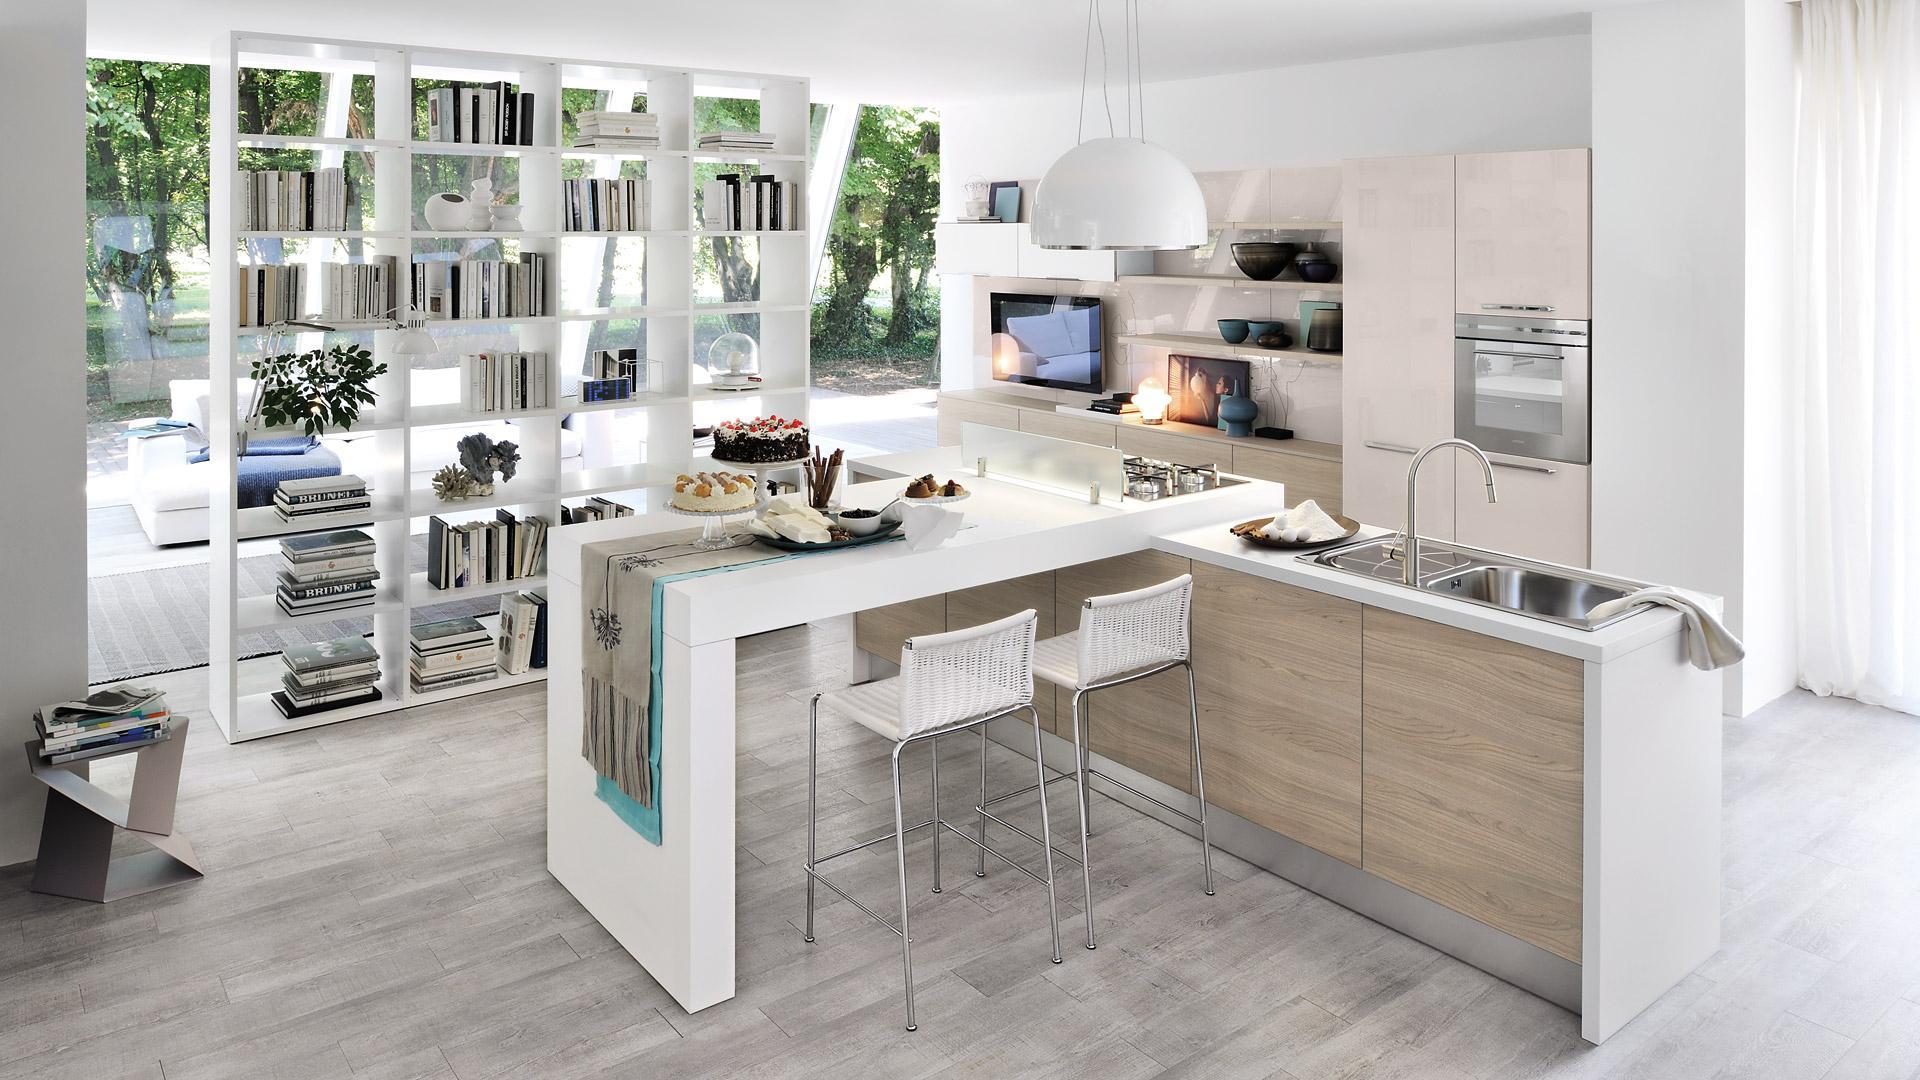 Ikea Cucine Genova Cucine Ikea Prezzi Cucina Ikea - Cucina Ikea ...